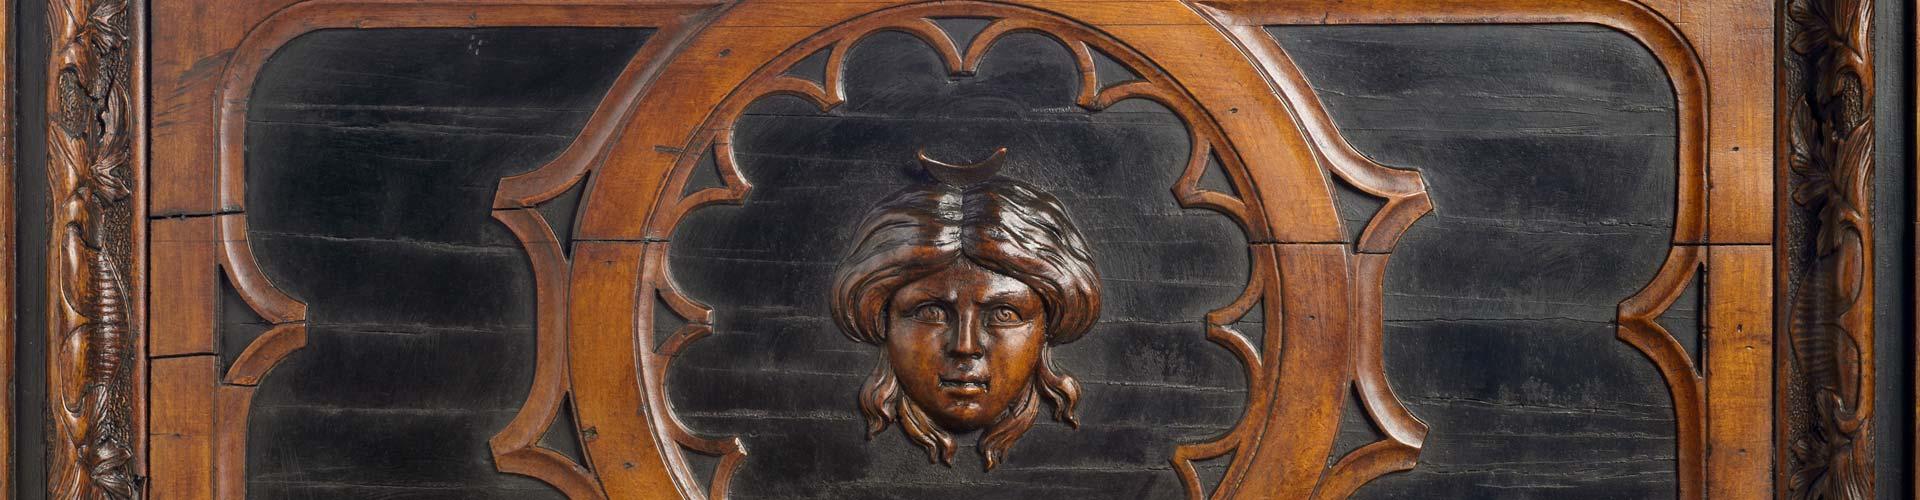 Mazzolini Giuseppucci Apothecary Museum in Fabriano - Fine wood carved interiors